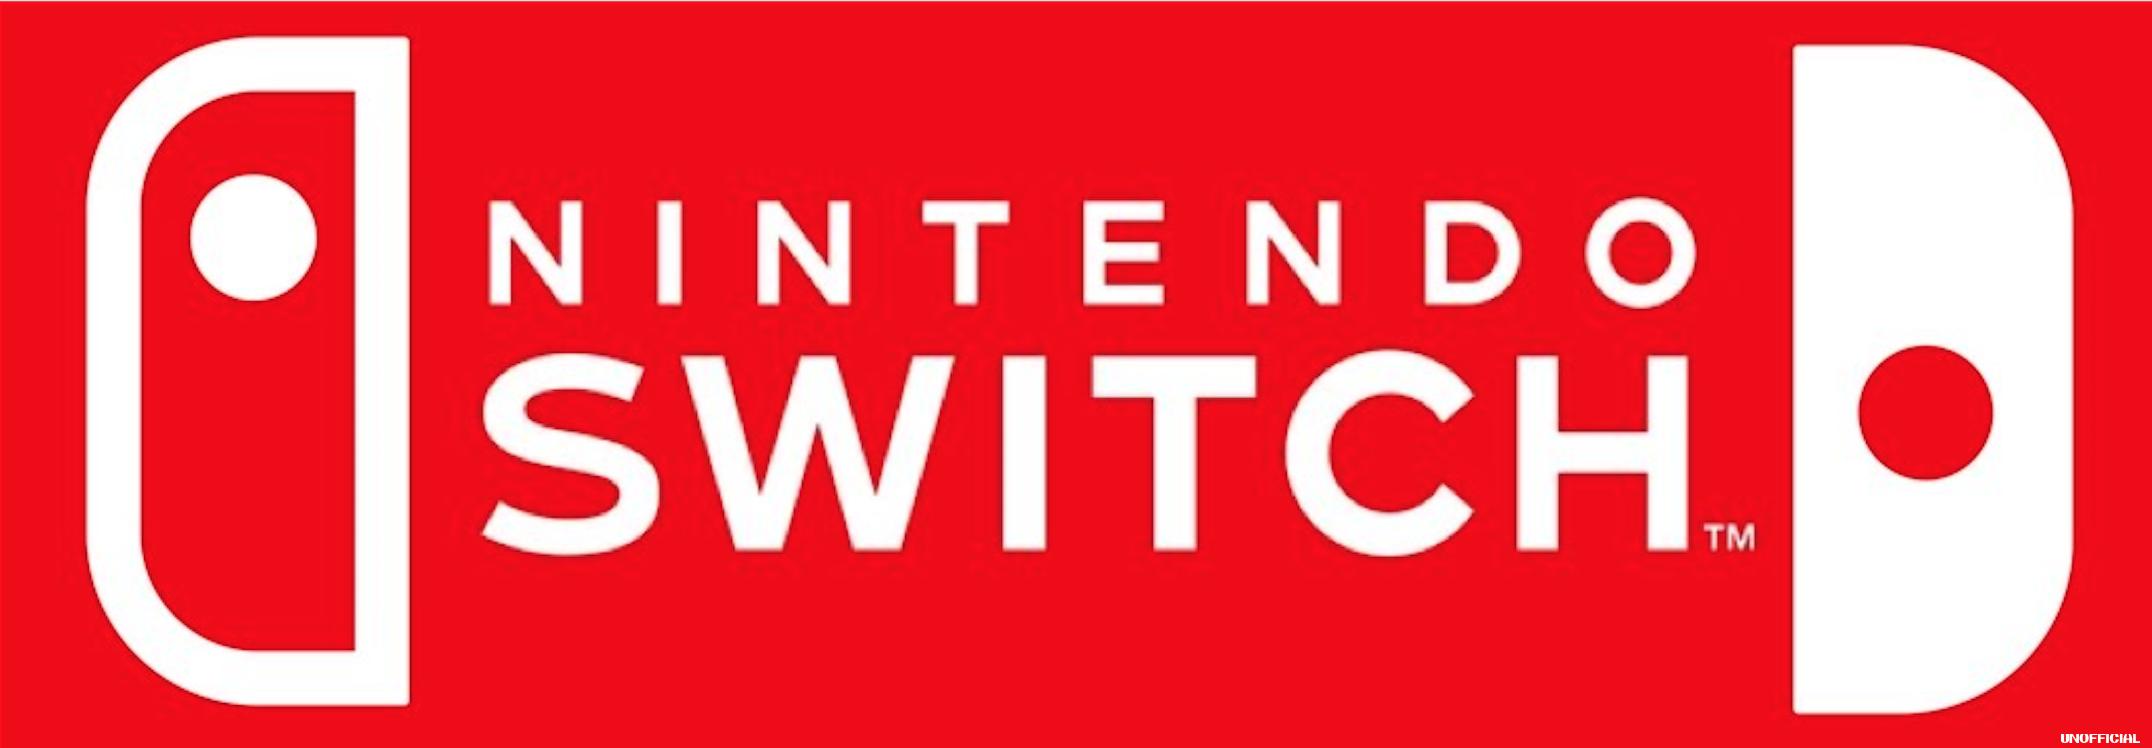 Nintendo Switch Wider Logo (Blatantly Derivative Of u.